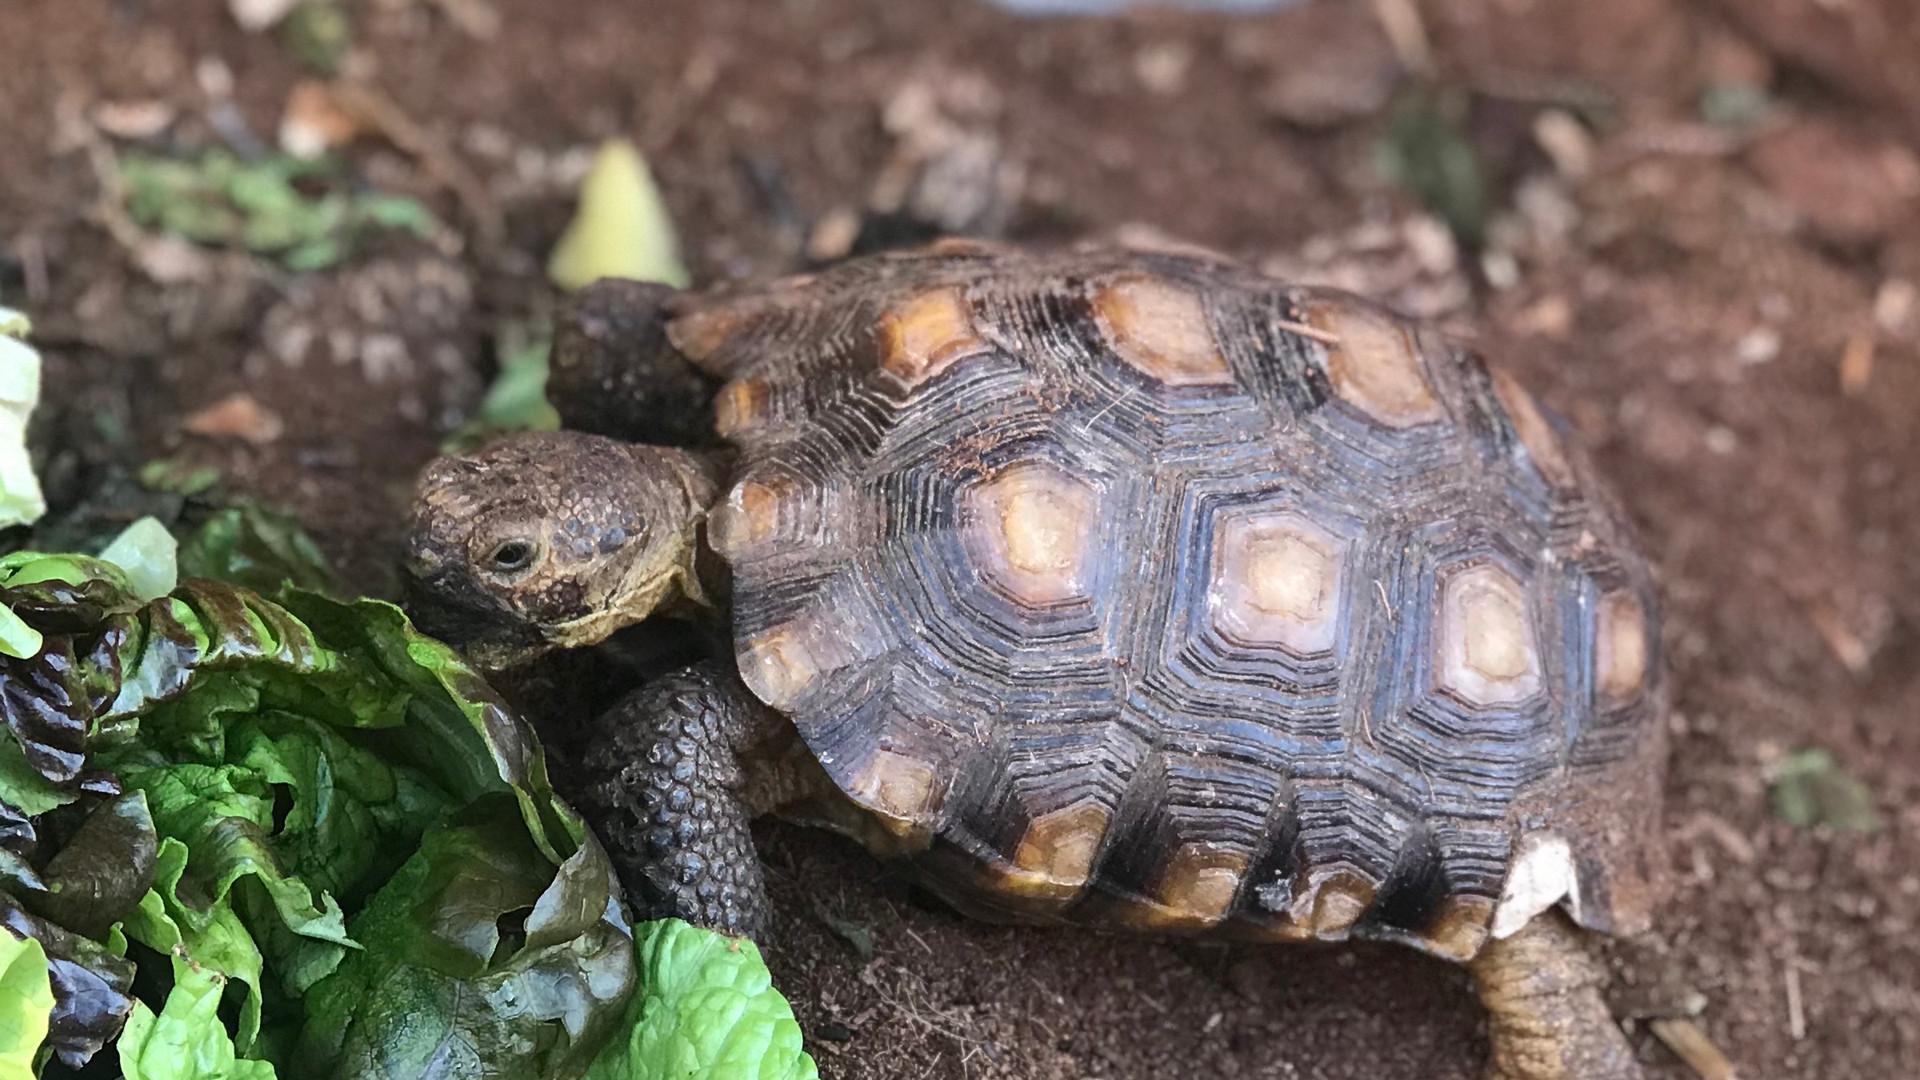 Tortoise-Touche.jpg